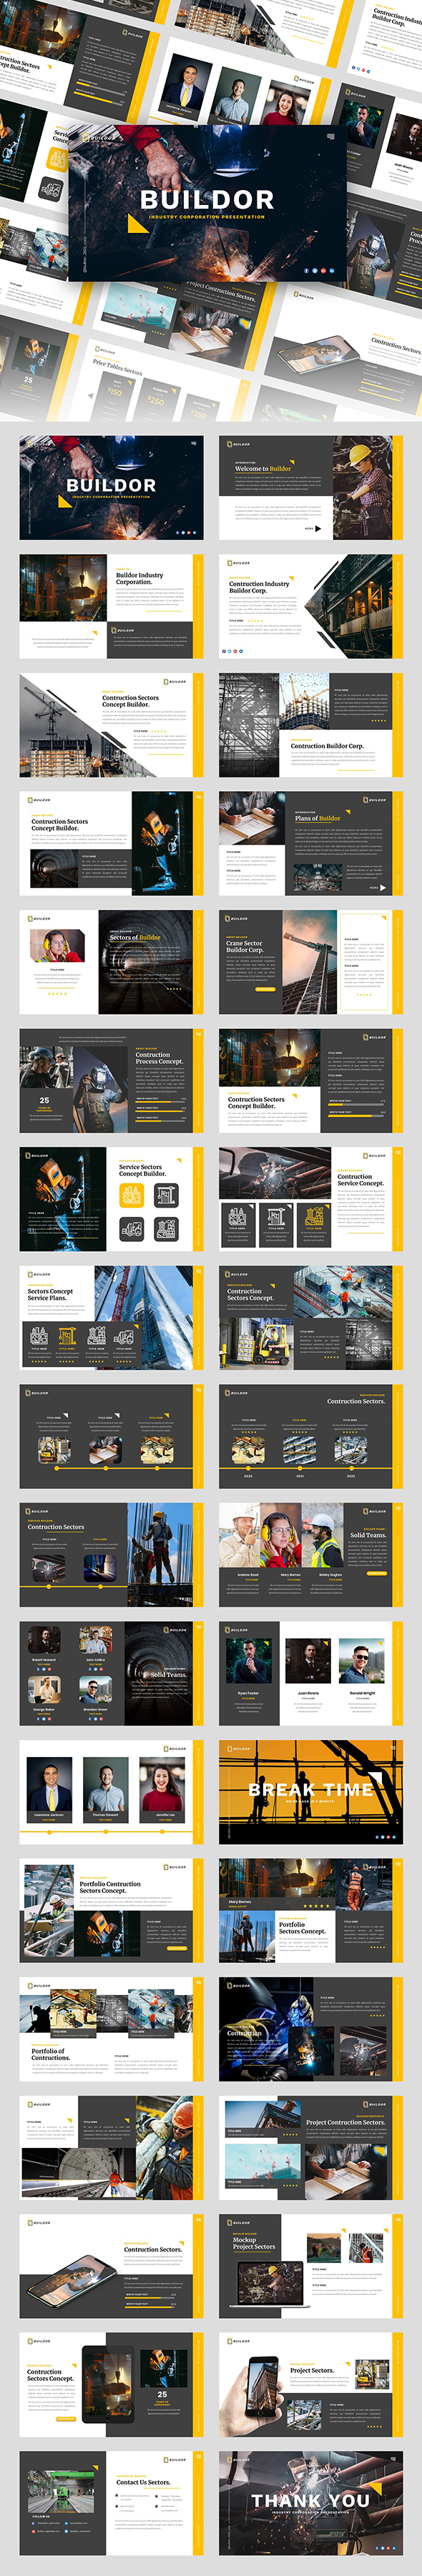 Buildor - Contruction Industrial PowerPoint Template